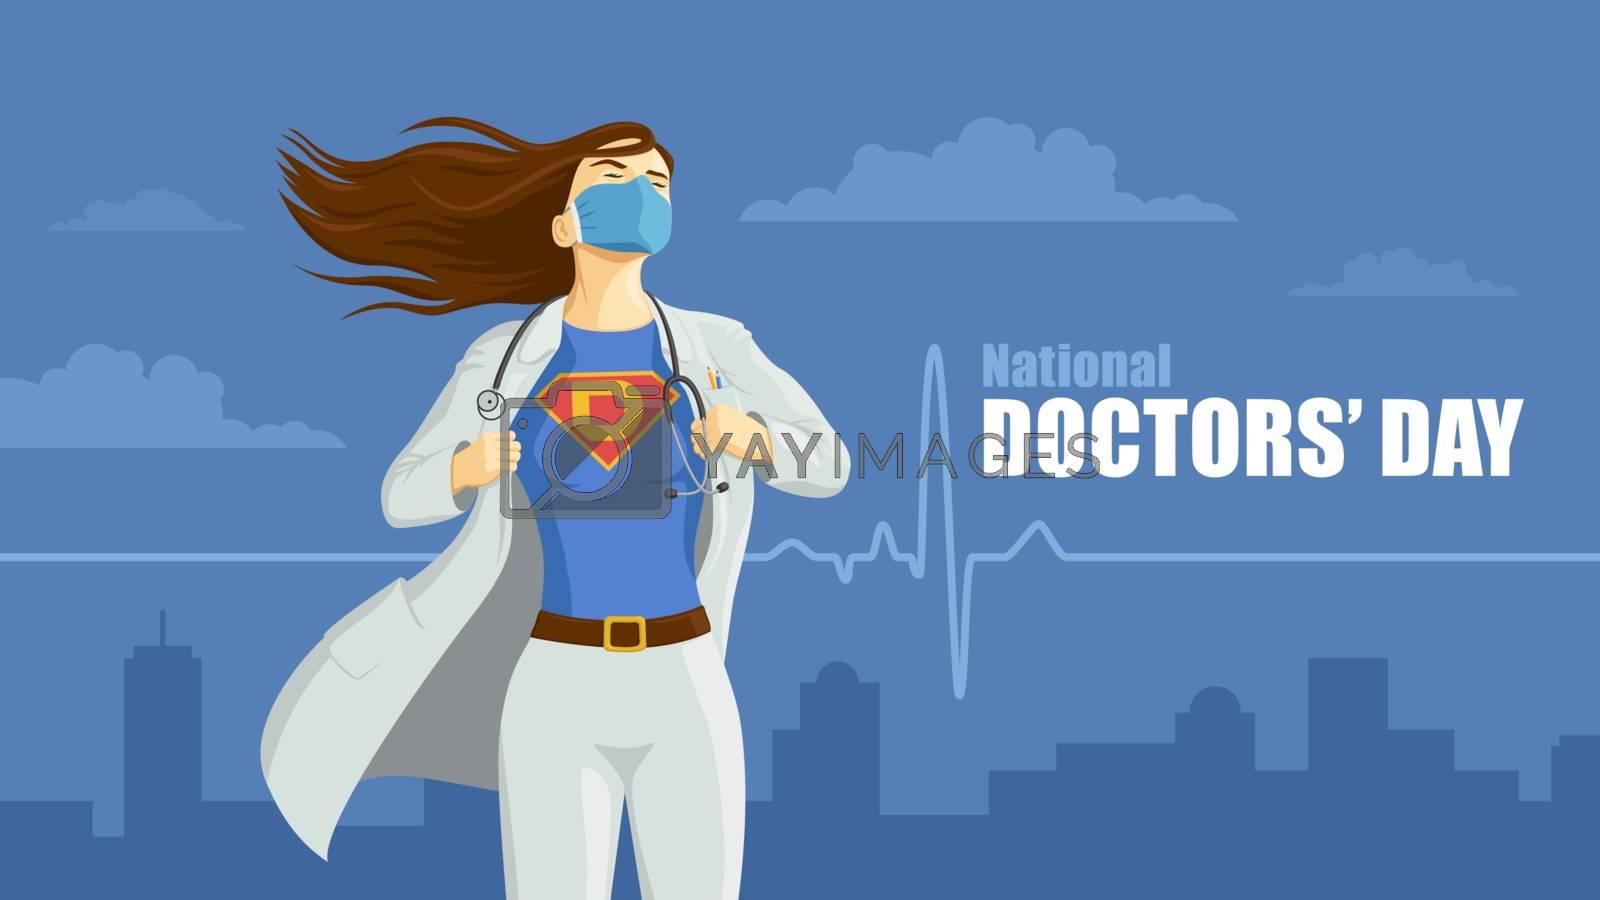 Detailed flat vector illustration of a doctor revealing her superhero emblem underneath her coat. National Doctors' Day.